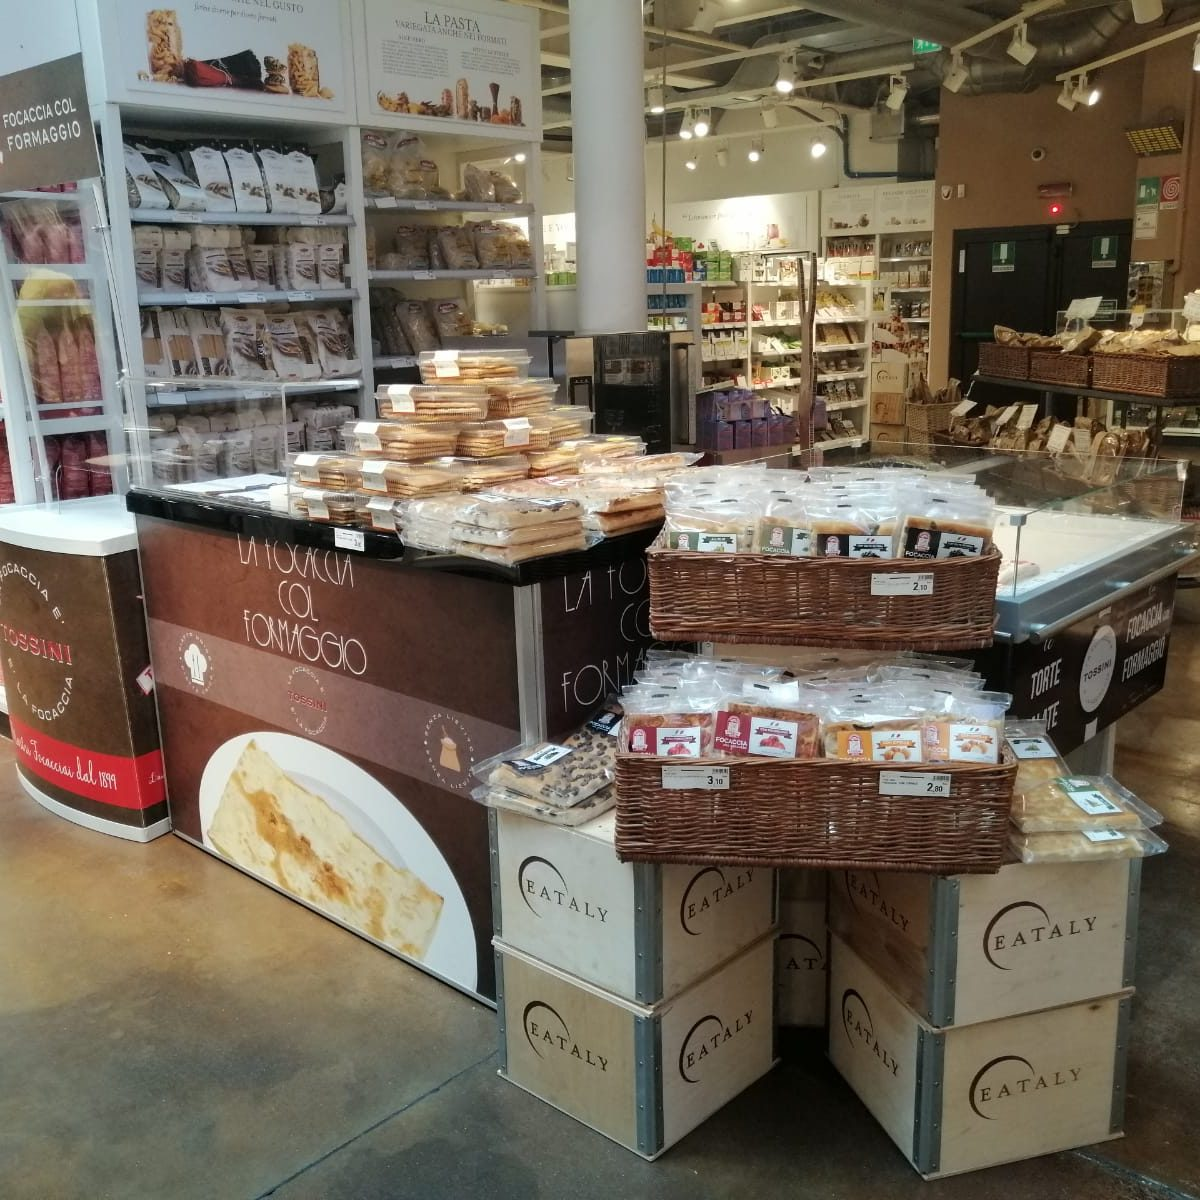 Corner Tossini -Eataly Store Milano Smeraldo (3)